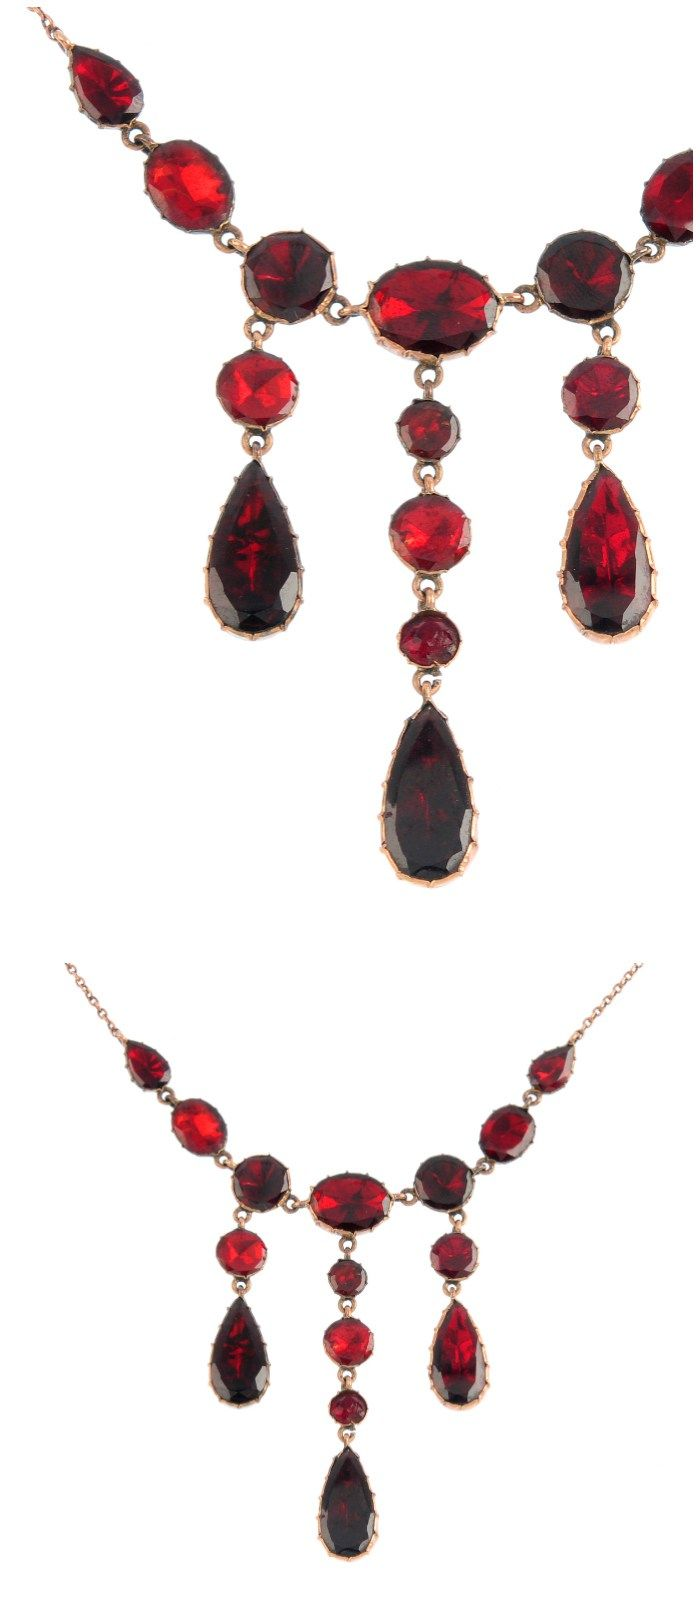 A beautiful antique foiled-back garnet necklace.